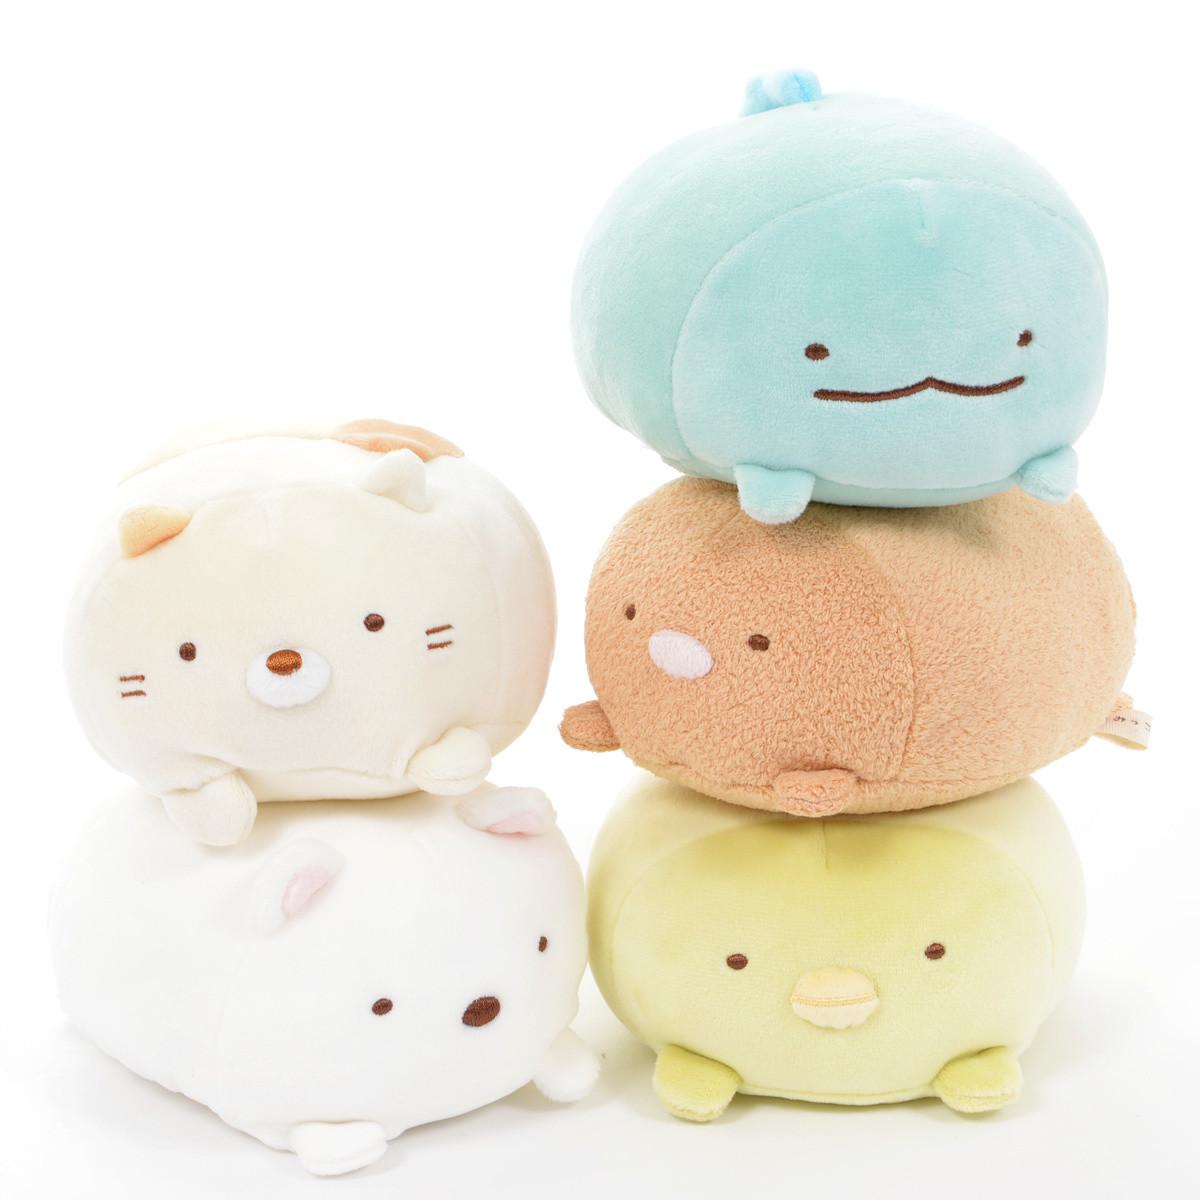 Sumikko Gurashi Super Mochi Mochi Plush Collection